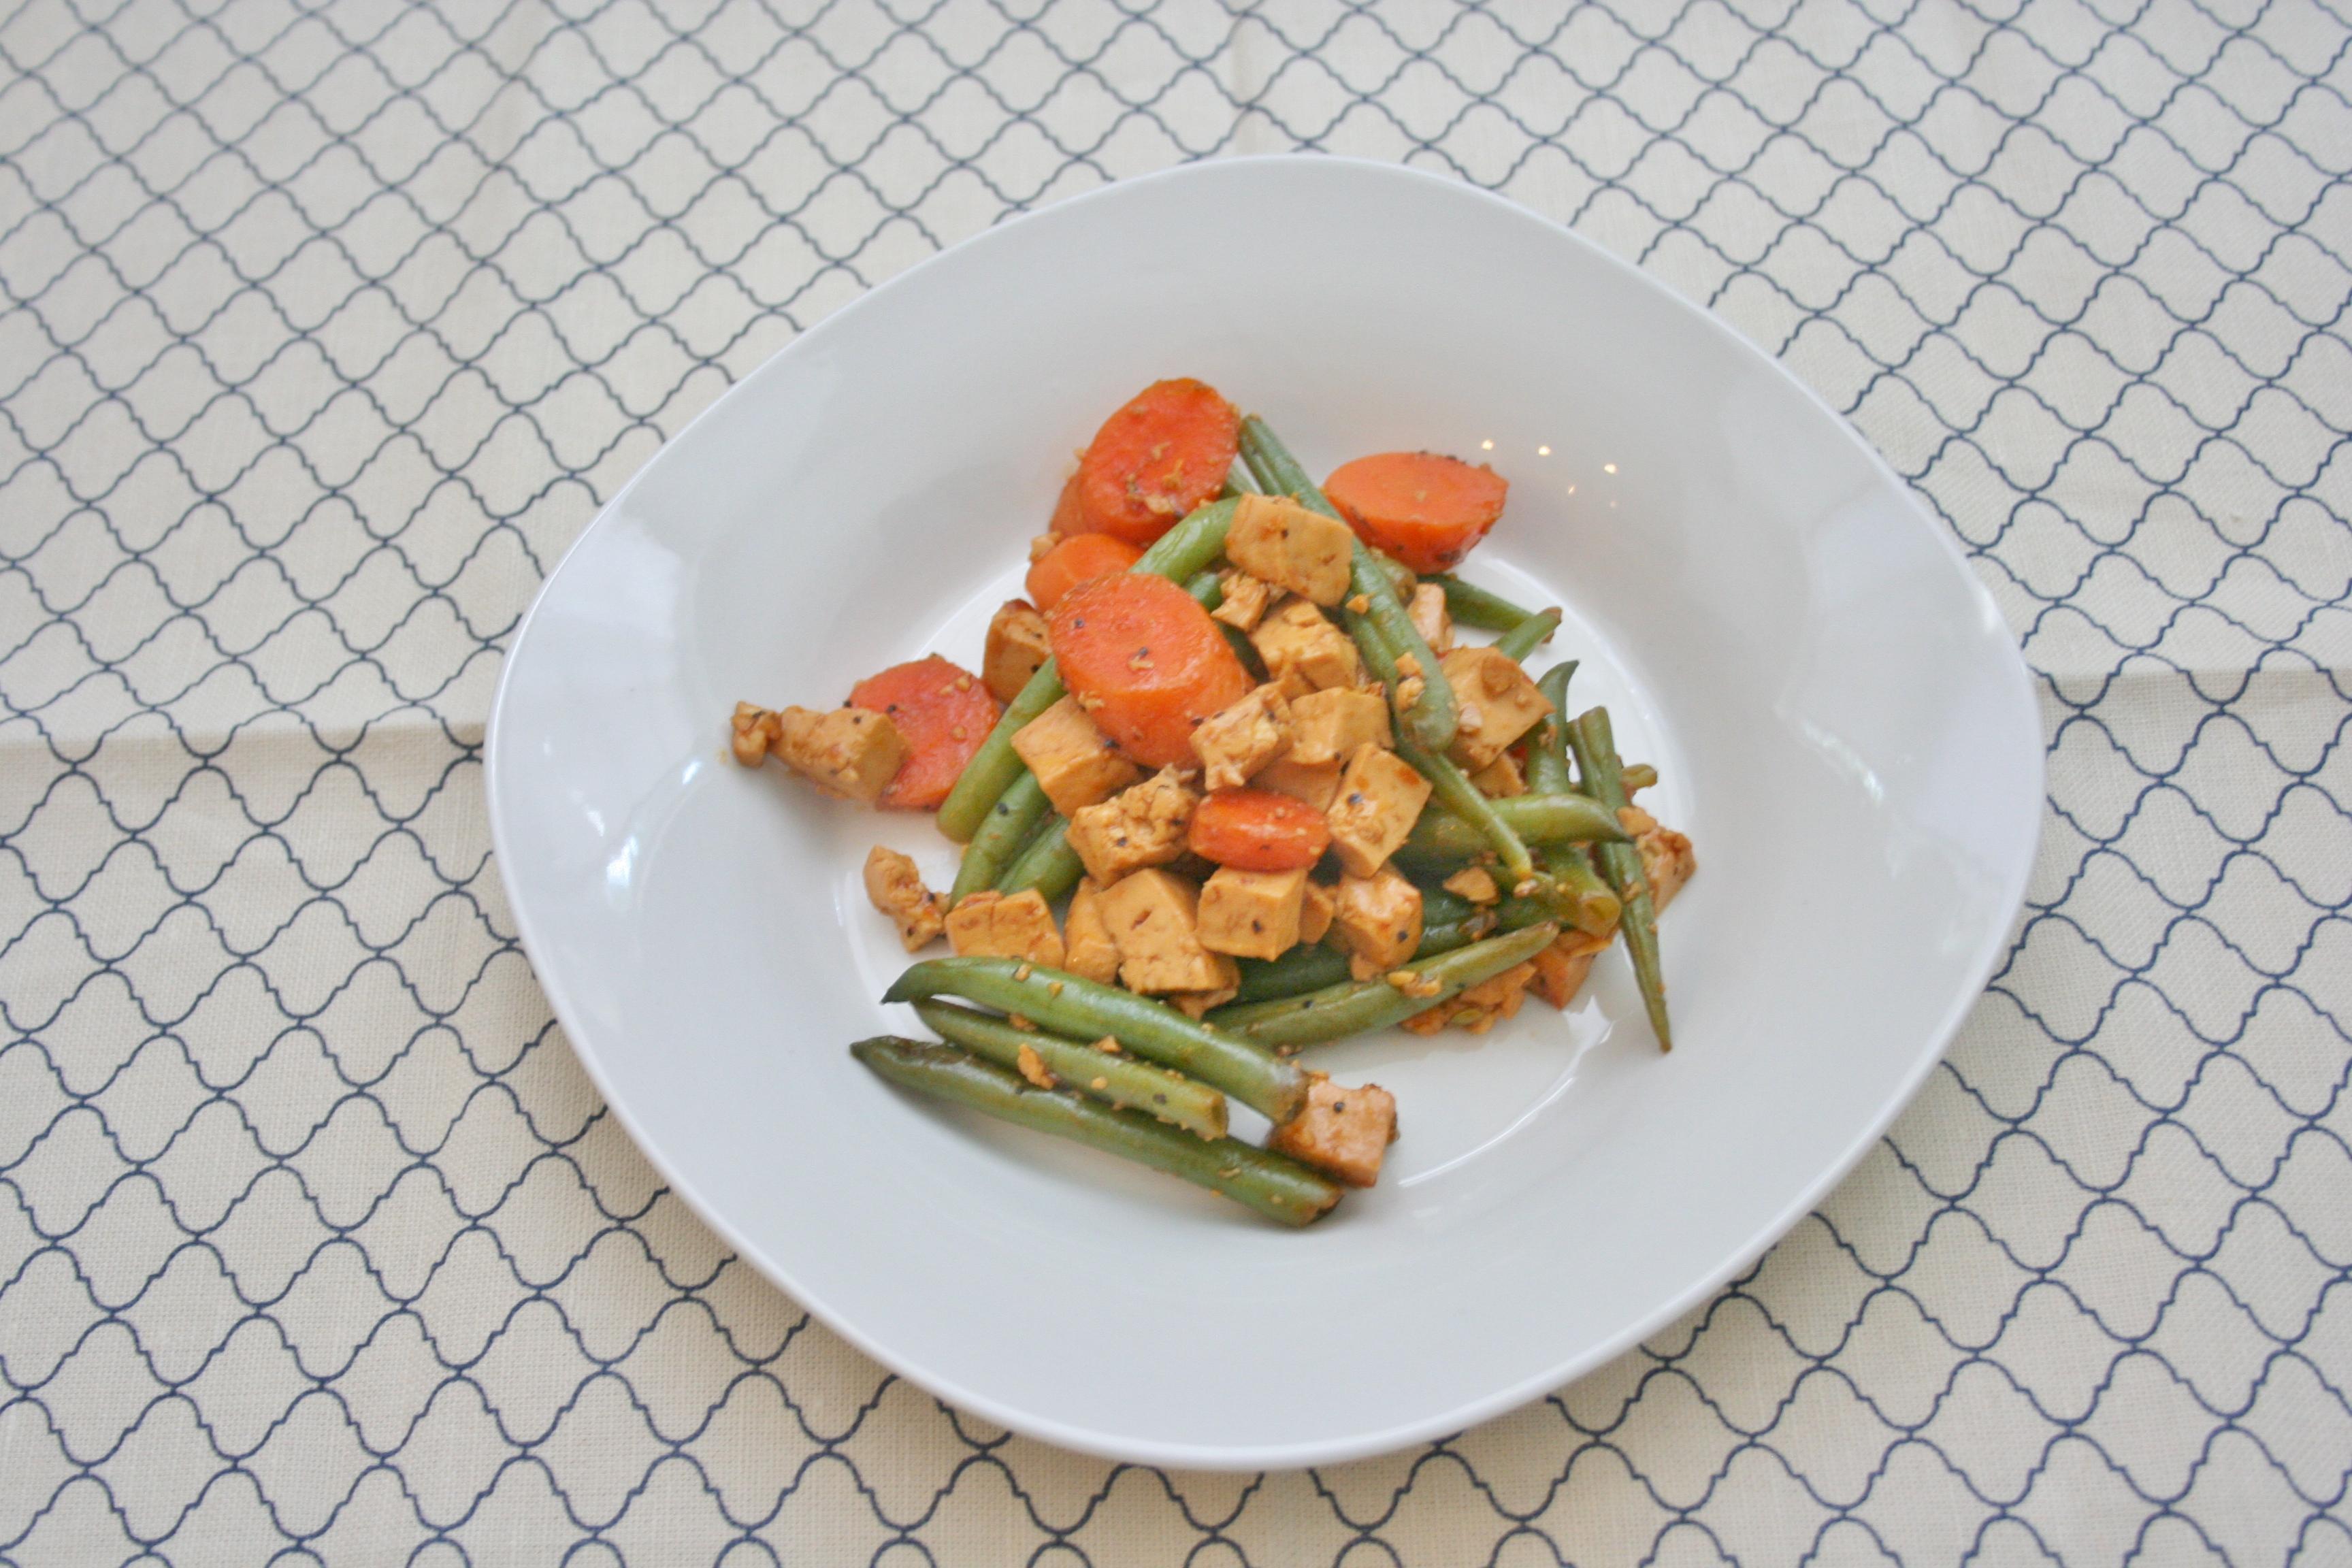 Vegan, Gluten-Free and Sugar-Free Sweet and Savory Tofu and Veggies